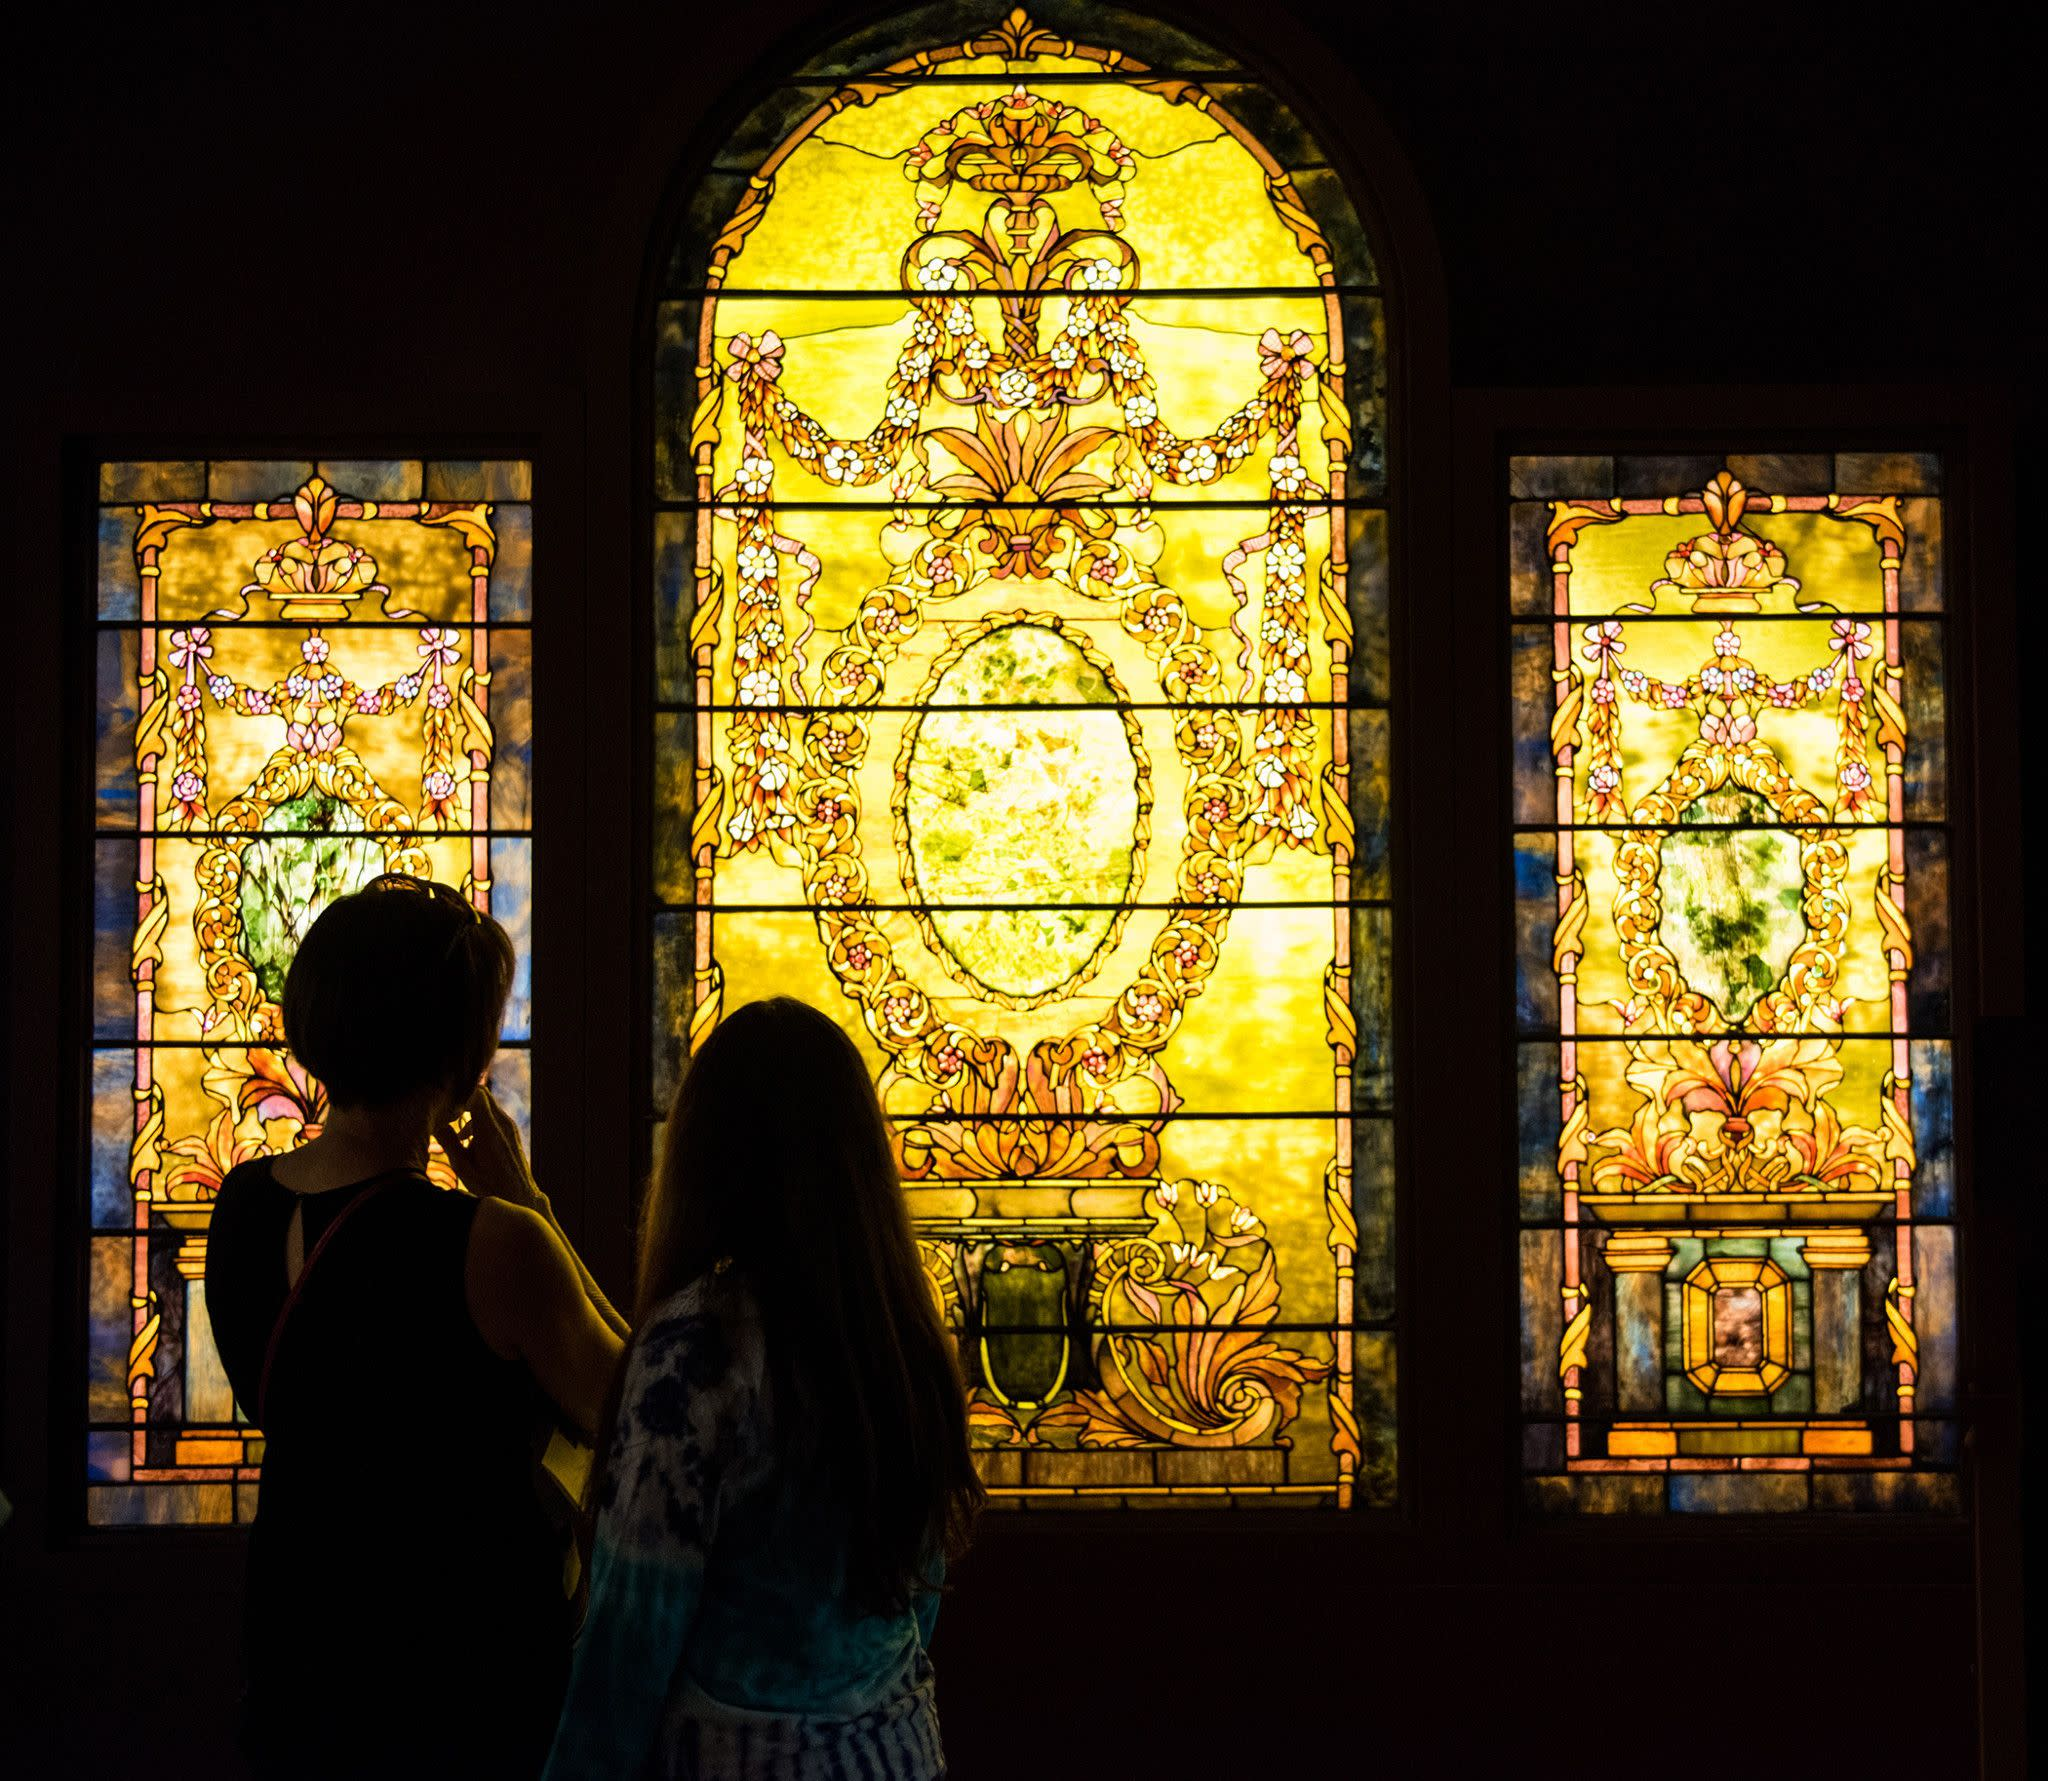 The Charles Hosmer Morse Museum of American Art in Winter Park